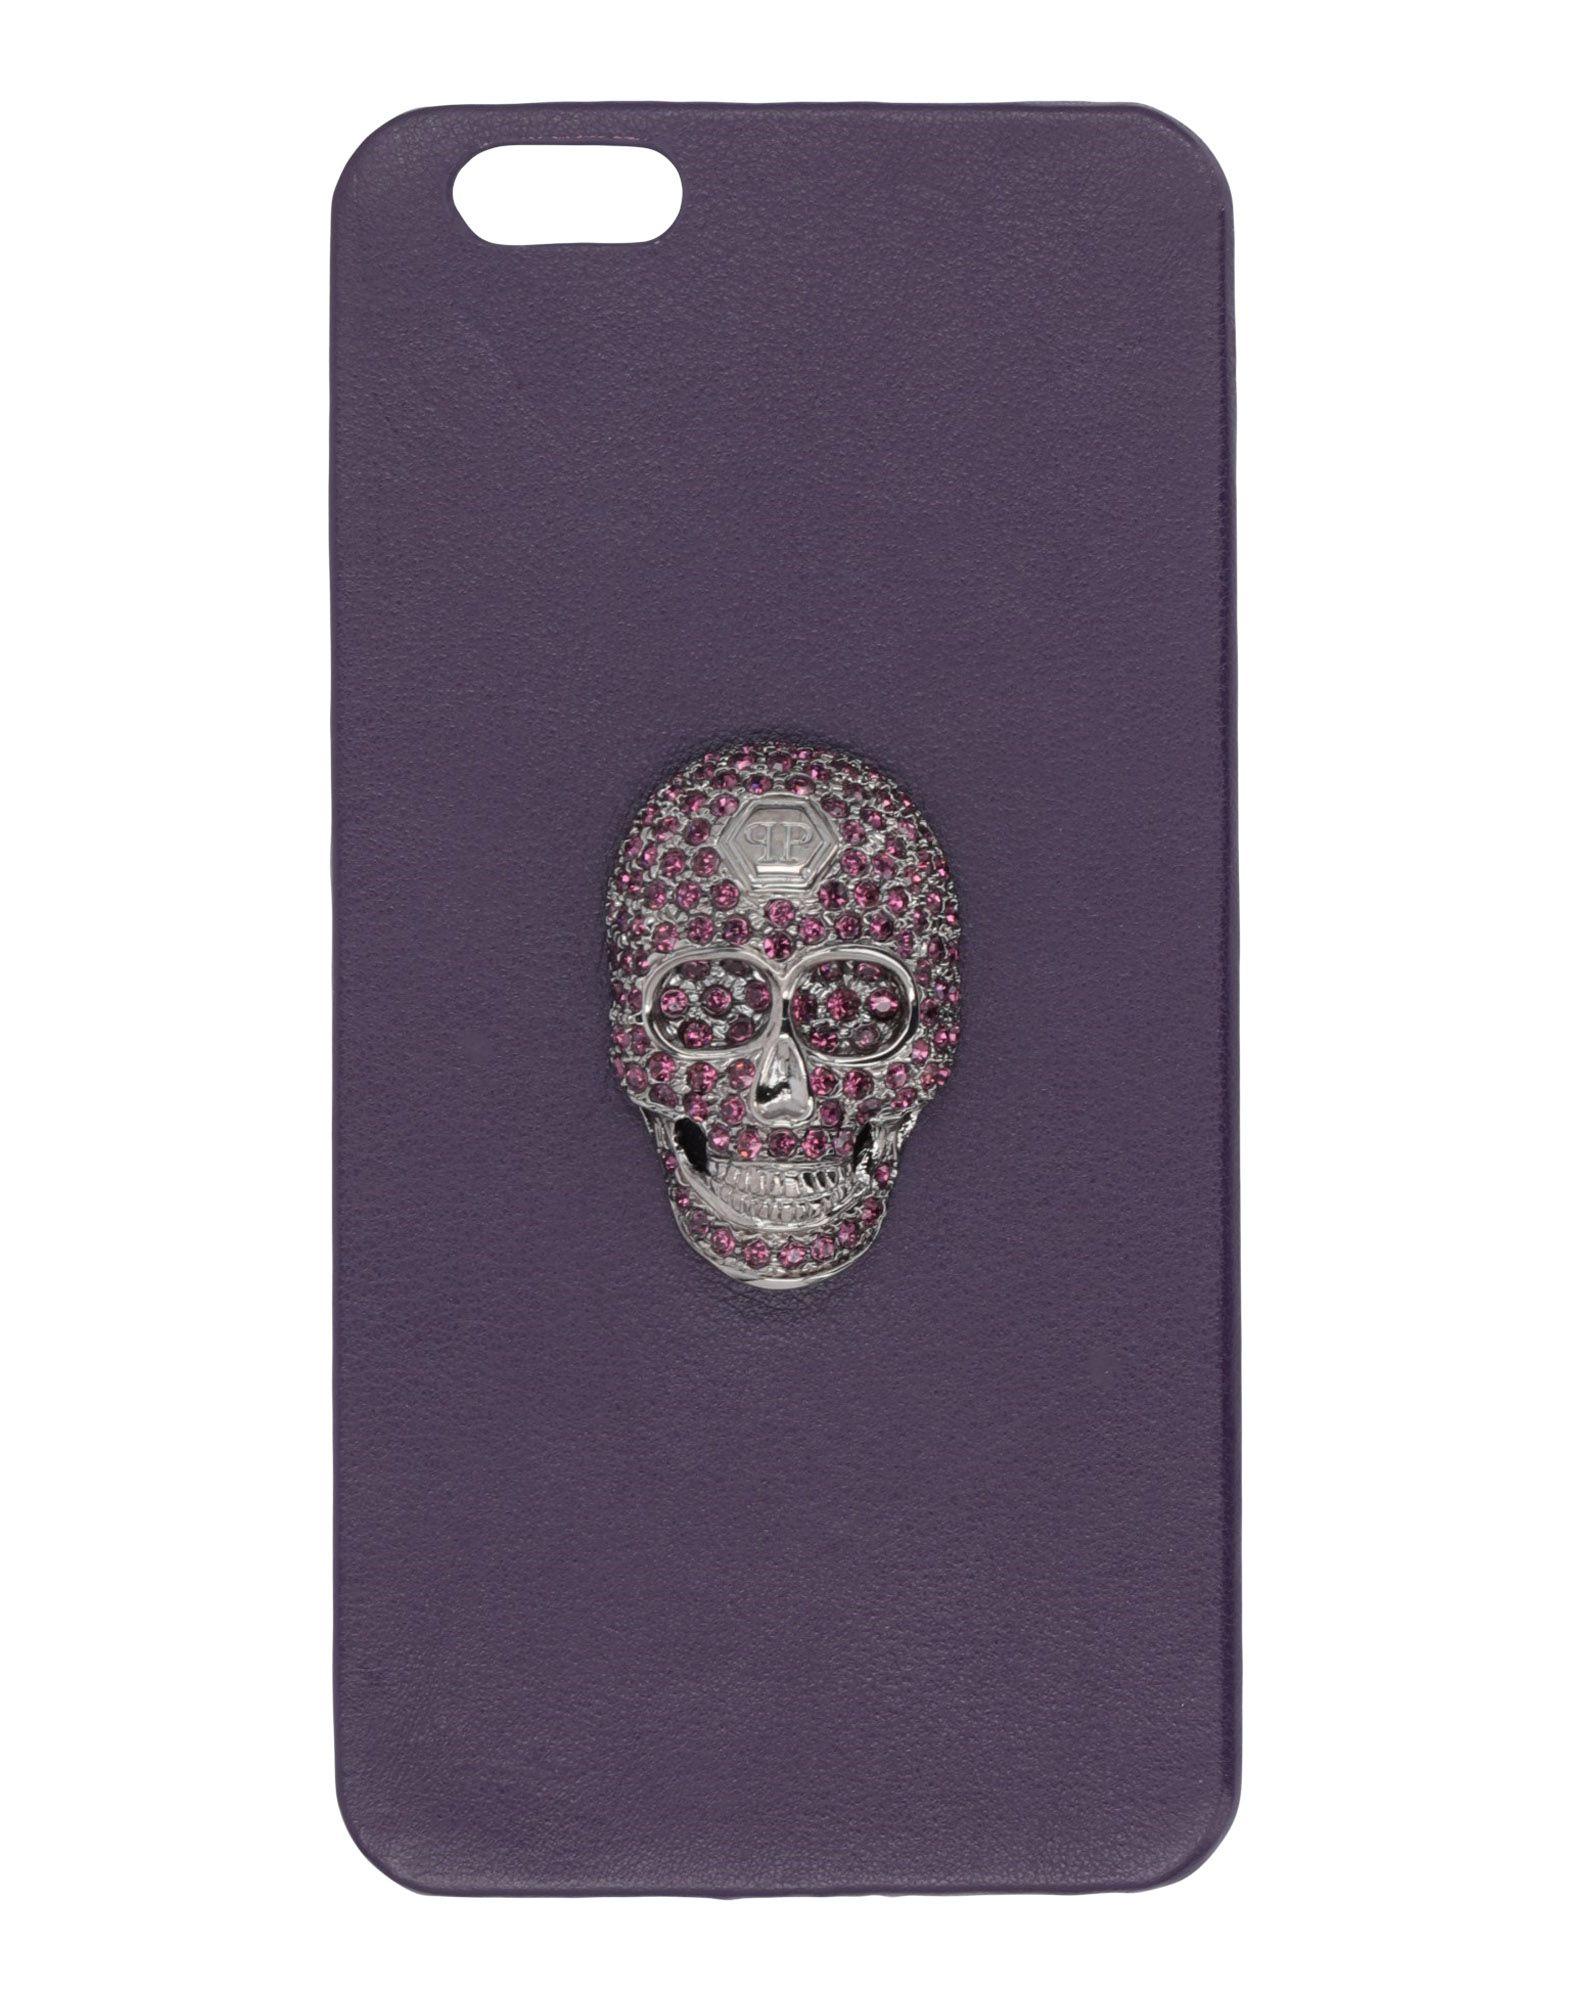 PHILIPP PLEIN Чехол браун роуз дизайн кожа pu откидная крышка бумажника карты держатель чехол для iphone 6s